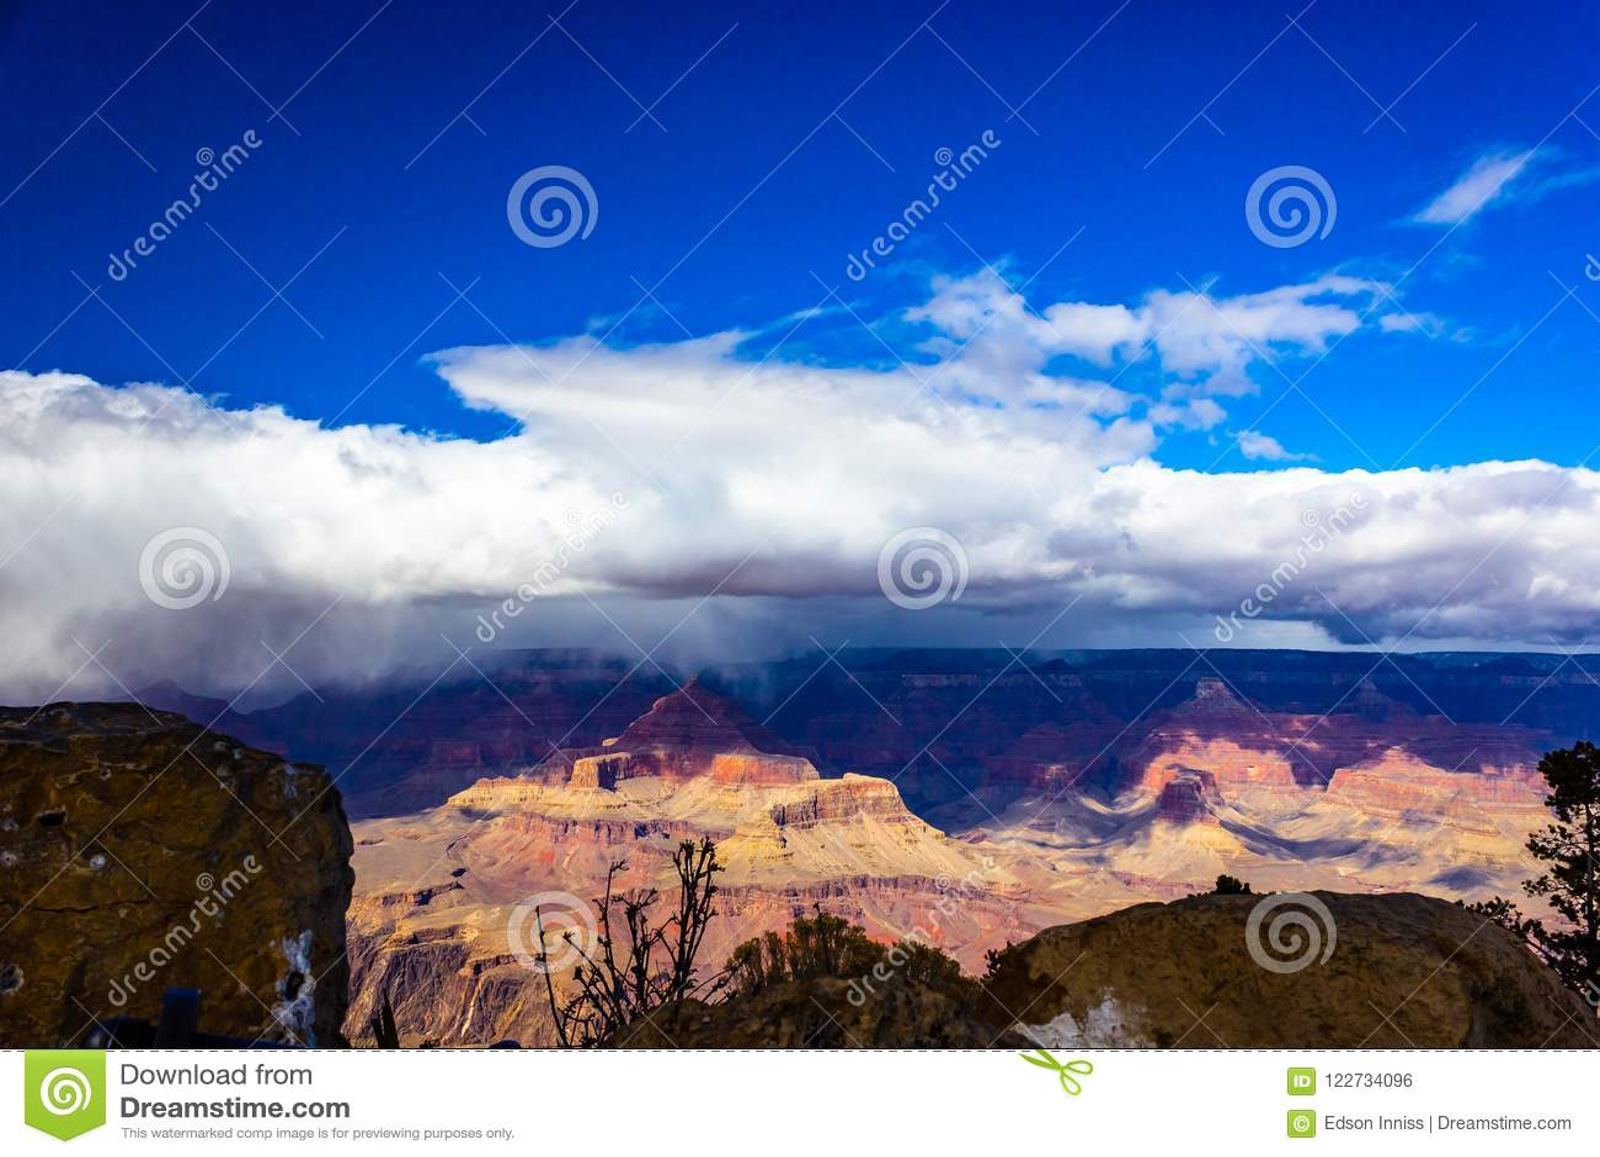 Grand Canyon National Park South Rim Arizona Usa Stock Photo